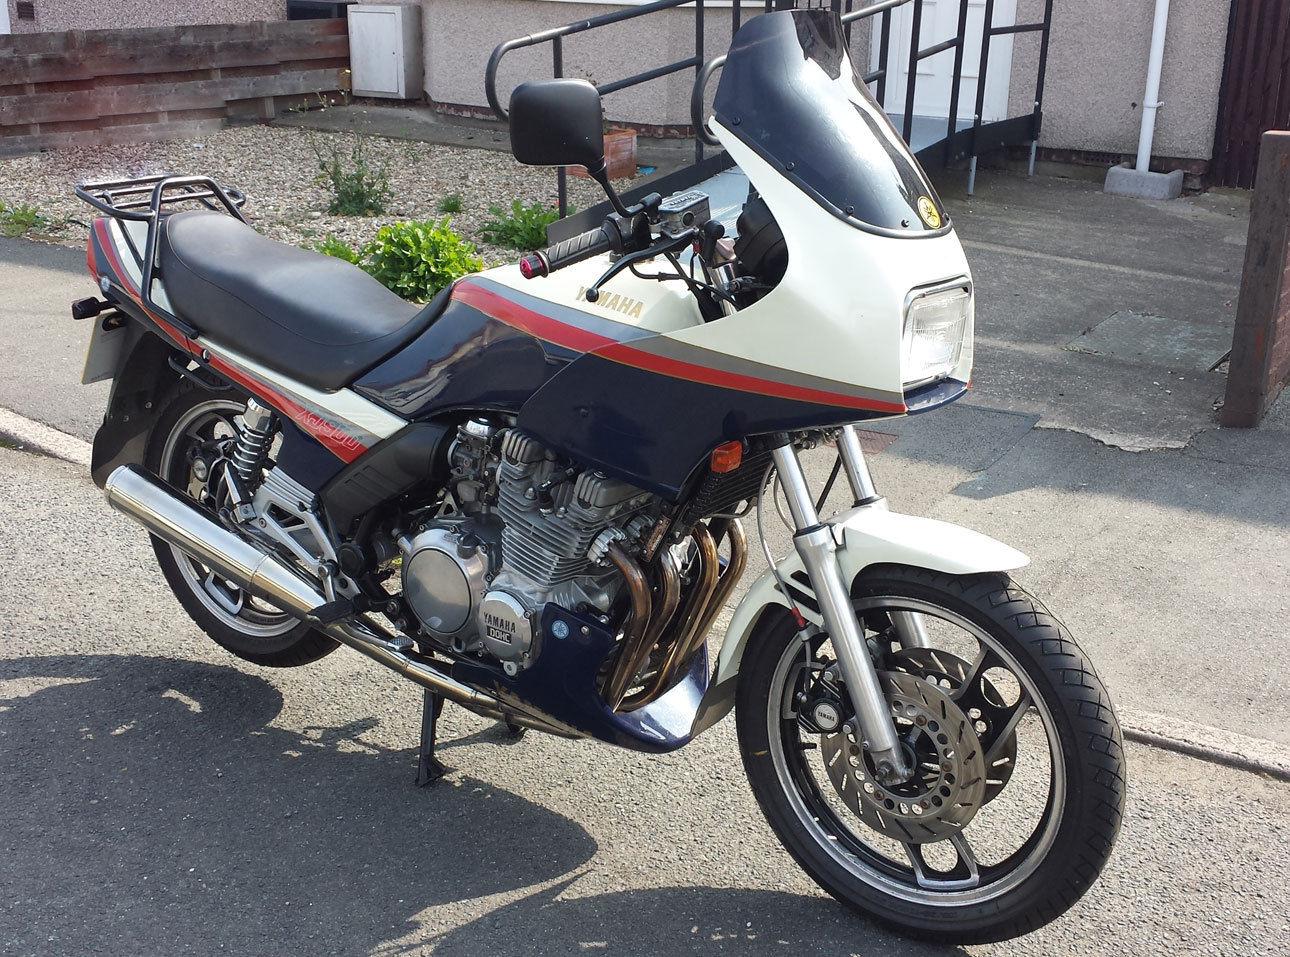 Who Makes Yamaha Motorcycle Ignition Keys